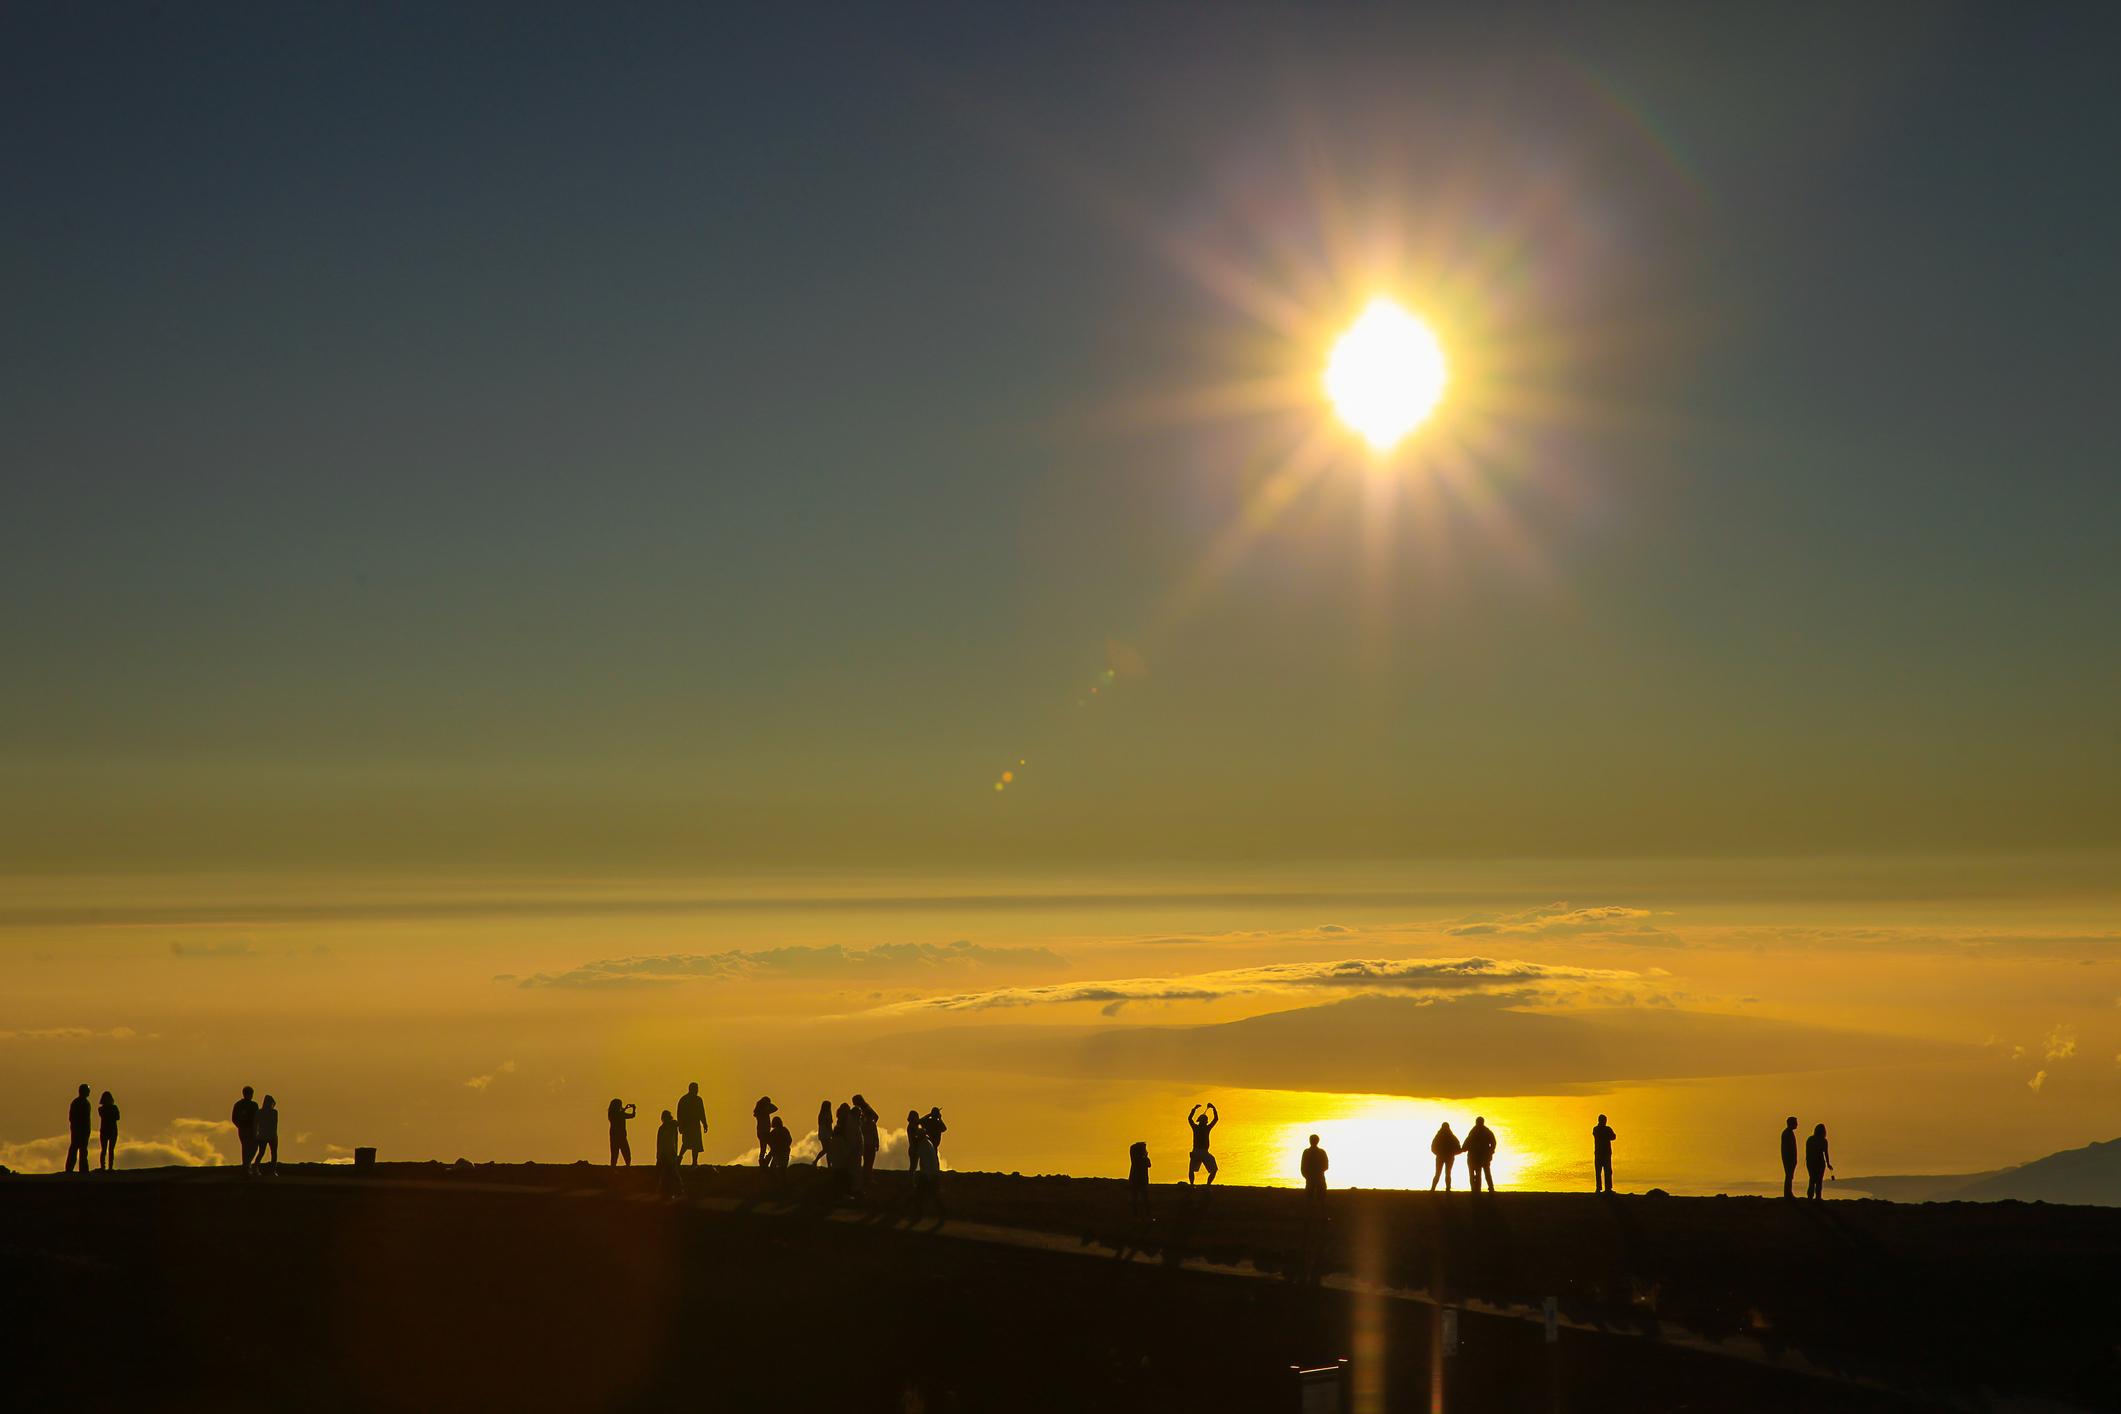 People watch sunrise at Haleakala volcano in Maui